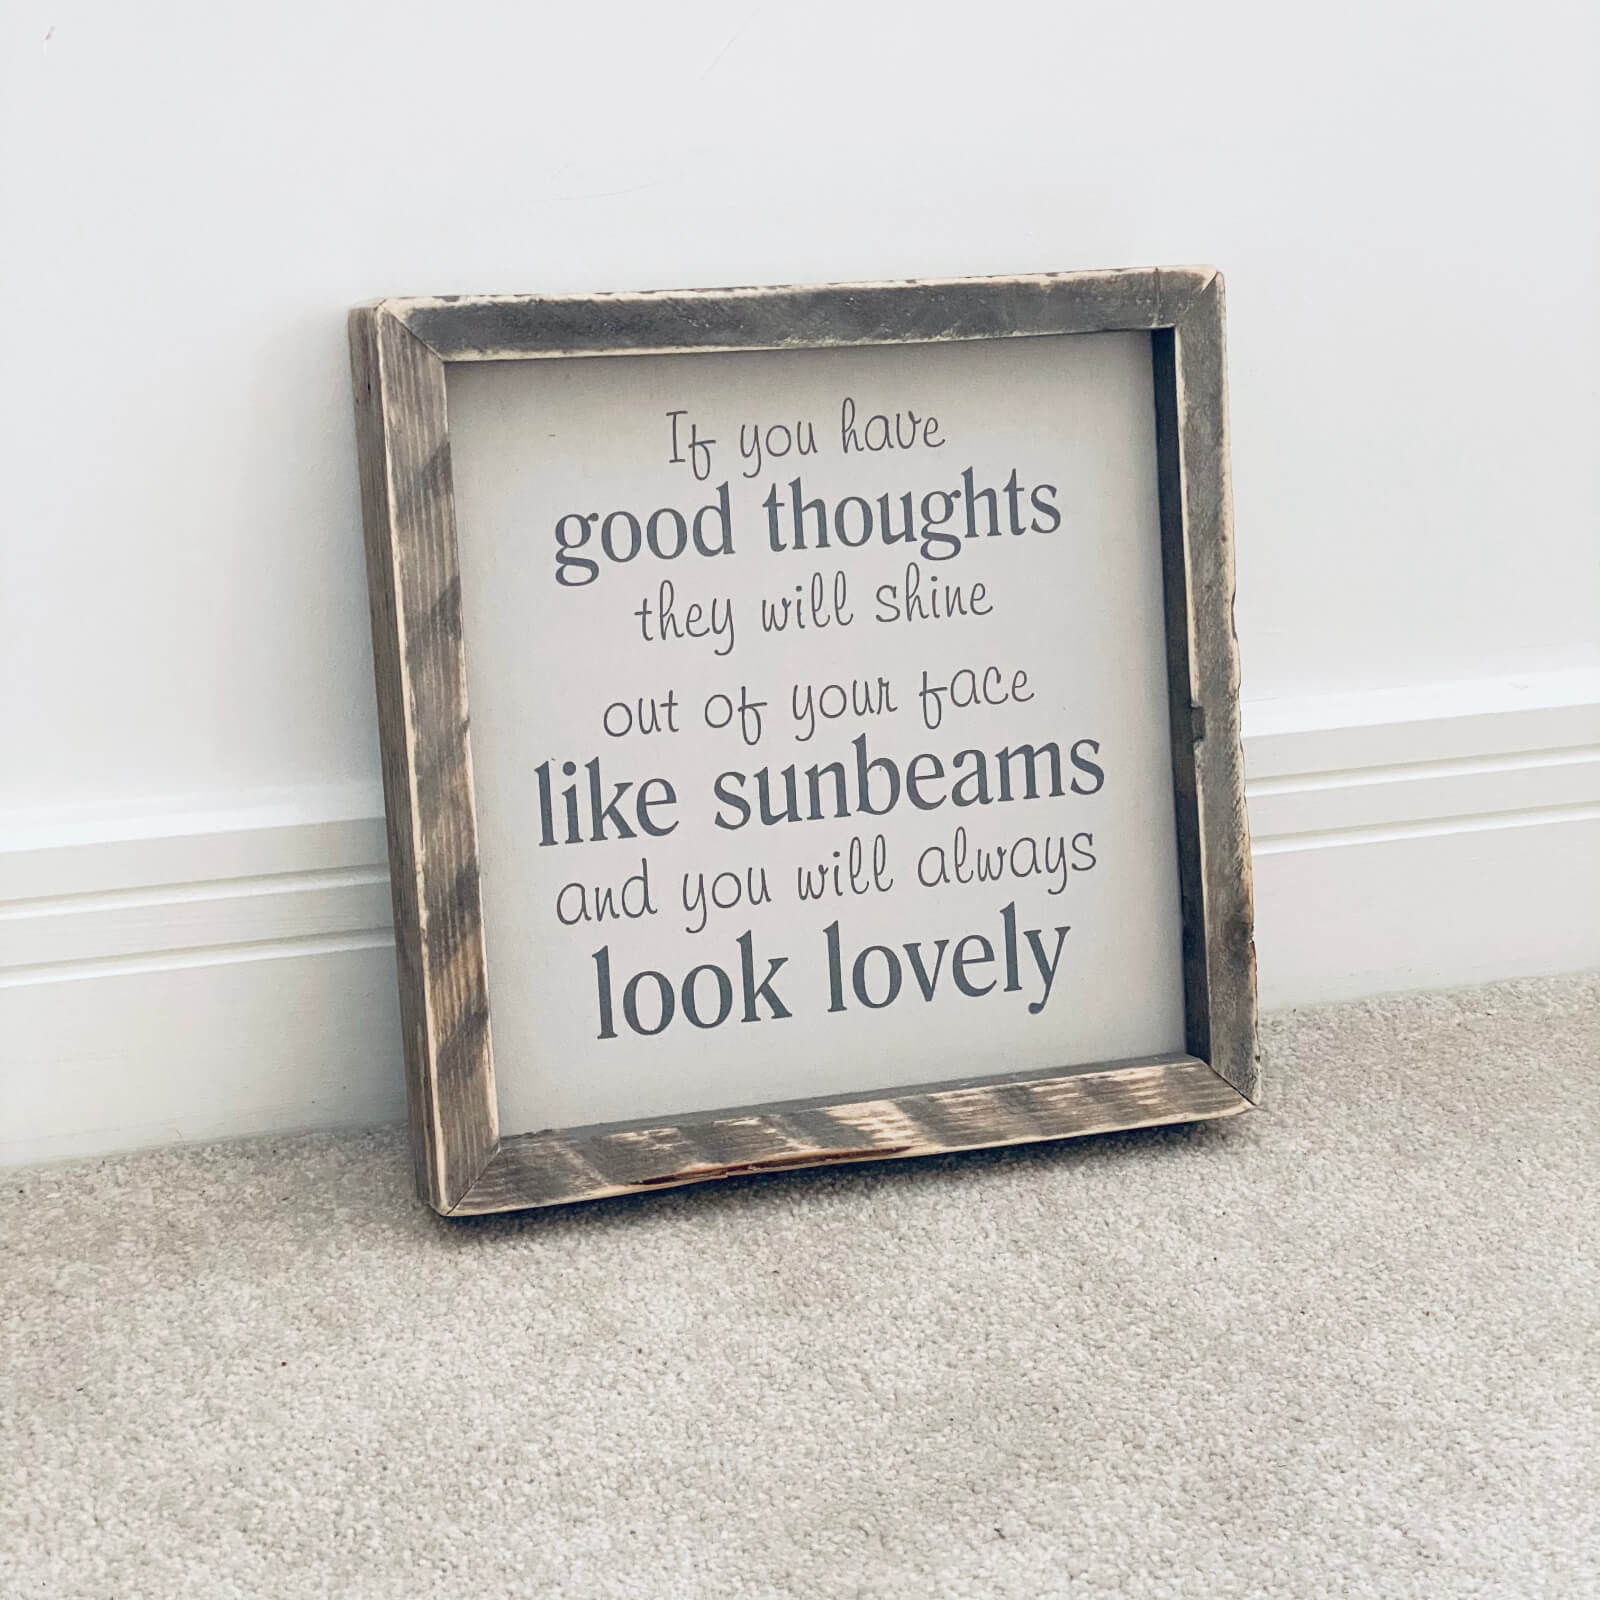 If you have good thoughts – Framed Wooden Sign Kind Shop